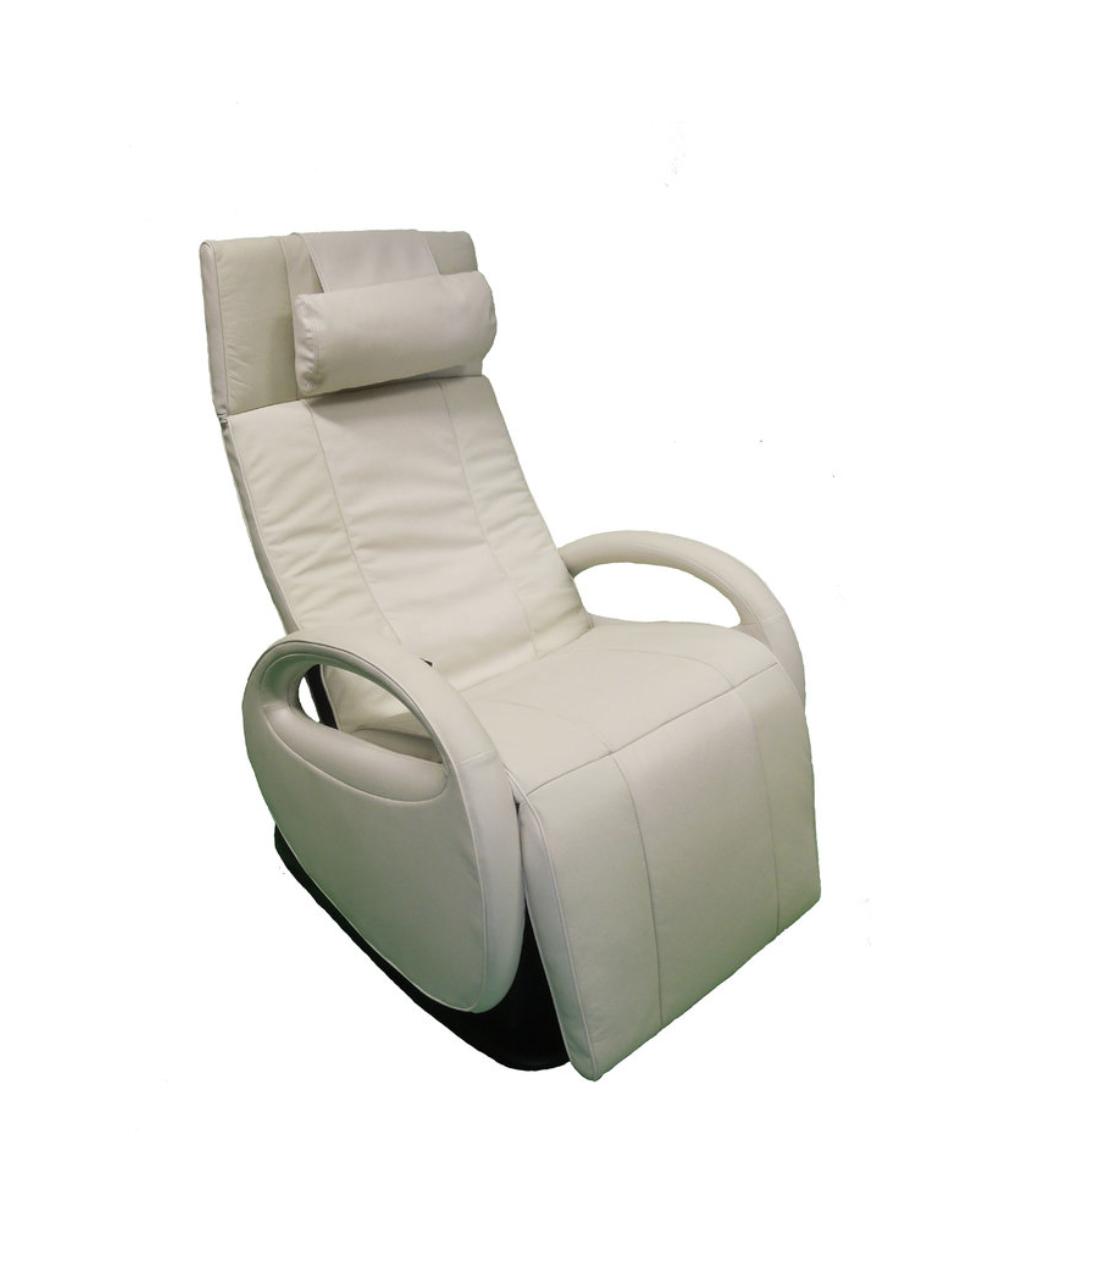 Fauteuil de massage AT FX2 ZeroG 2